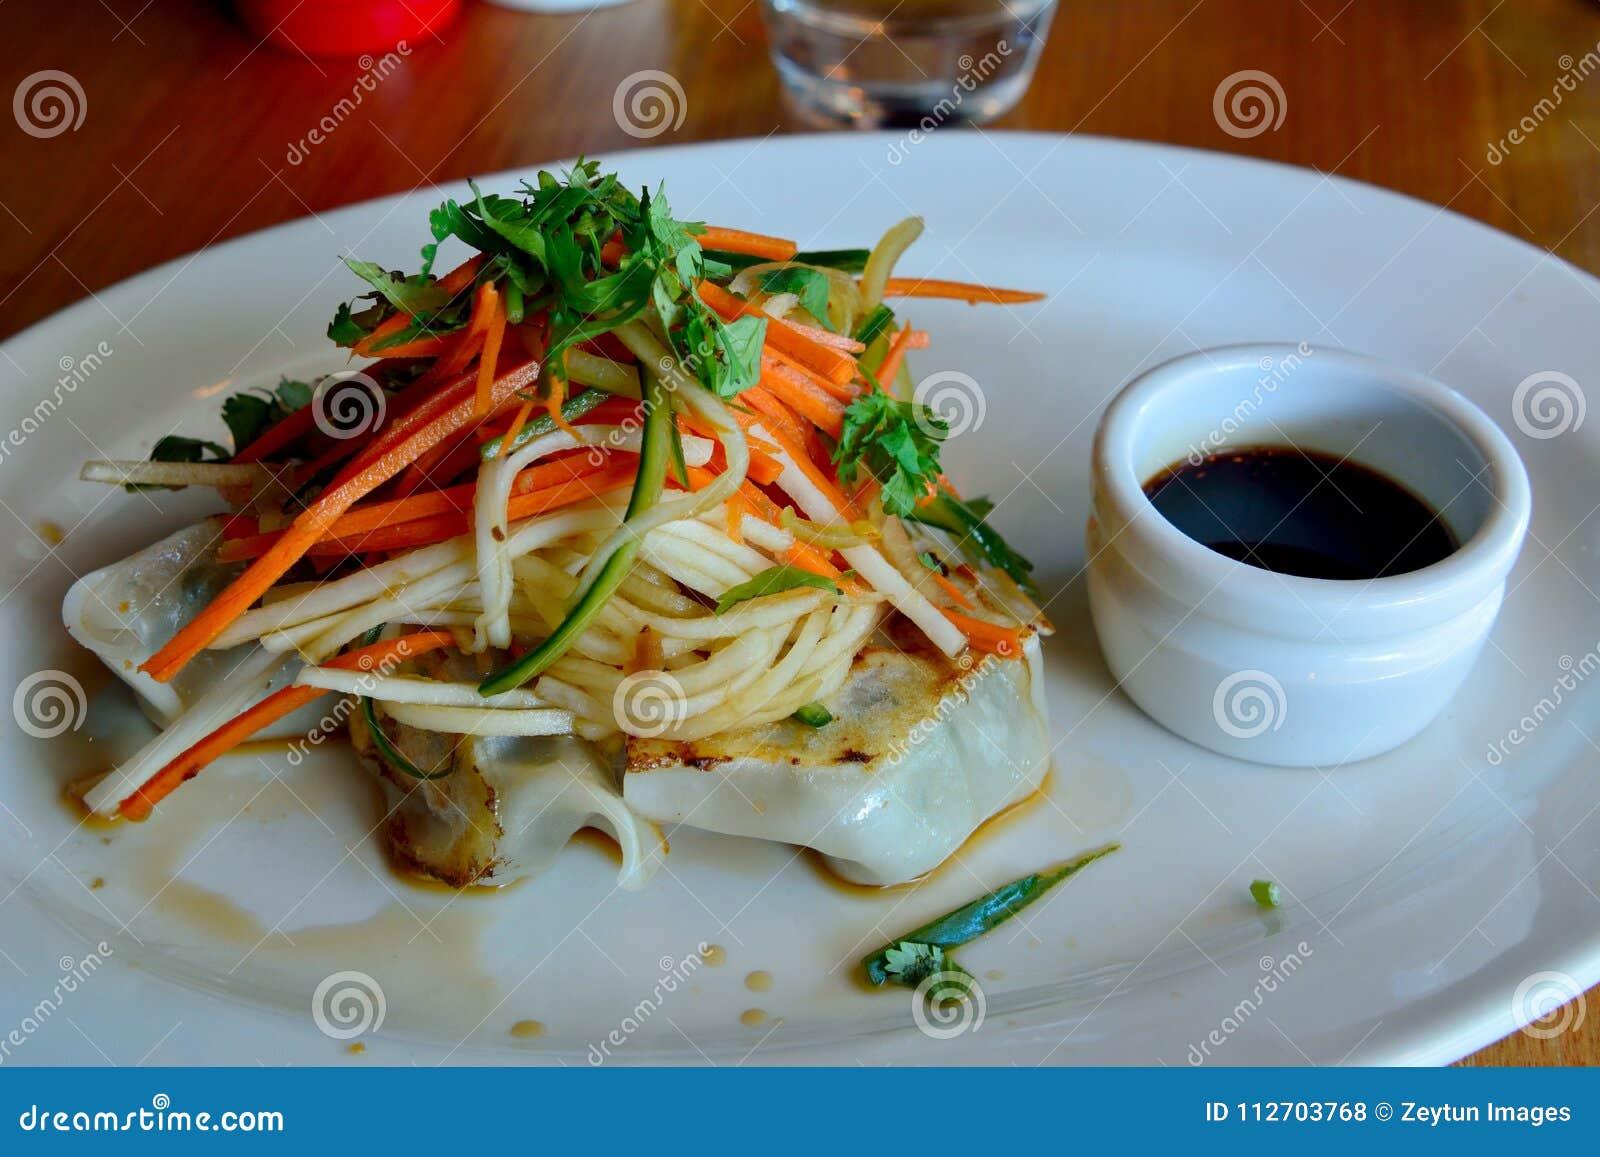 Pan Fried Dumpling With Salad Stock Photo - Image of ...